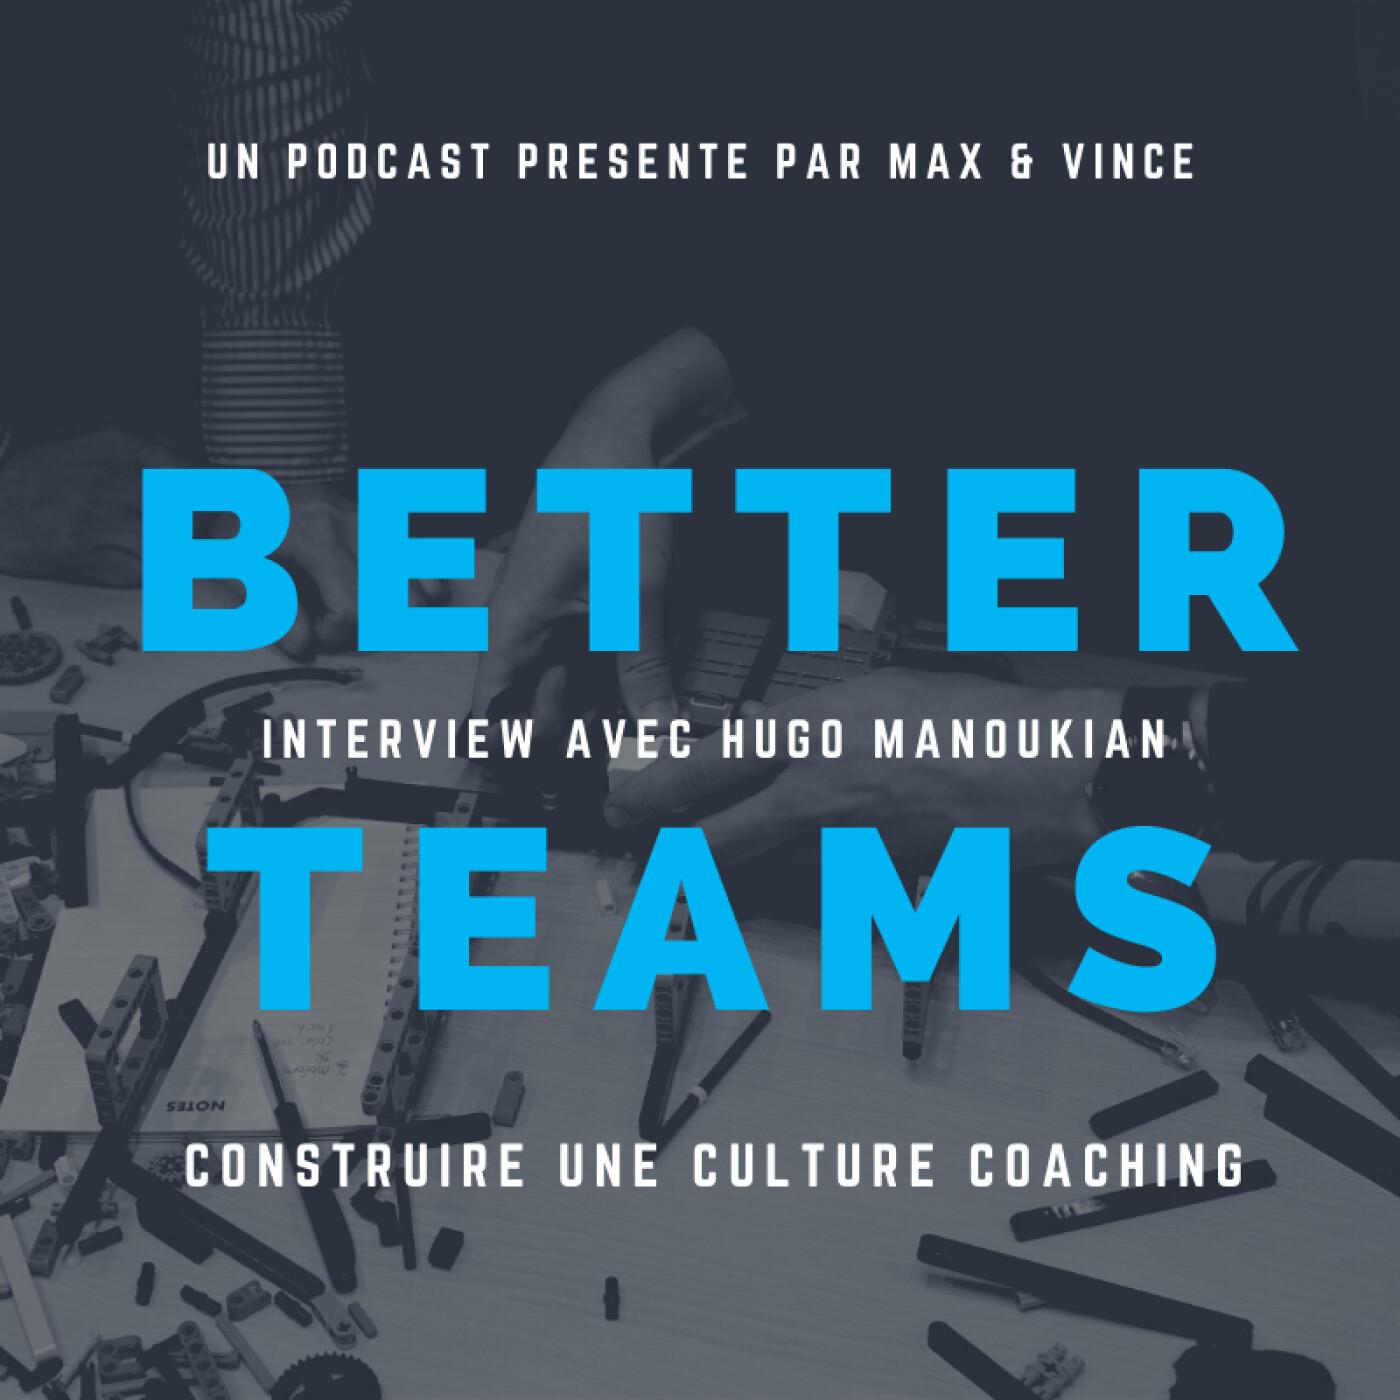 Construire une culture coaching -  Interview avec Hugo Manoukian